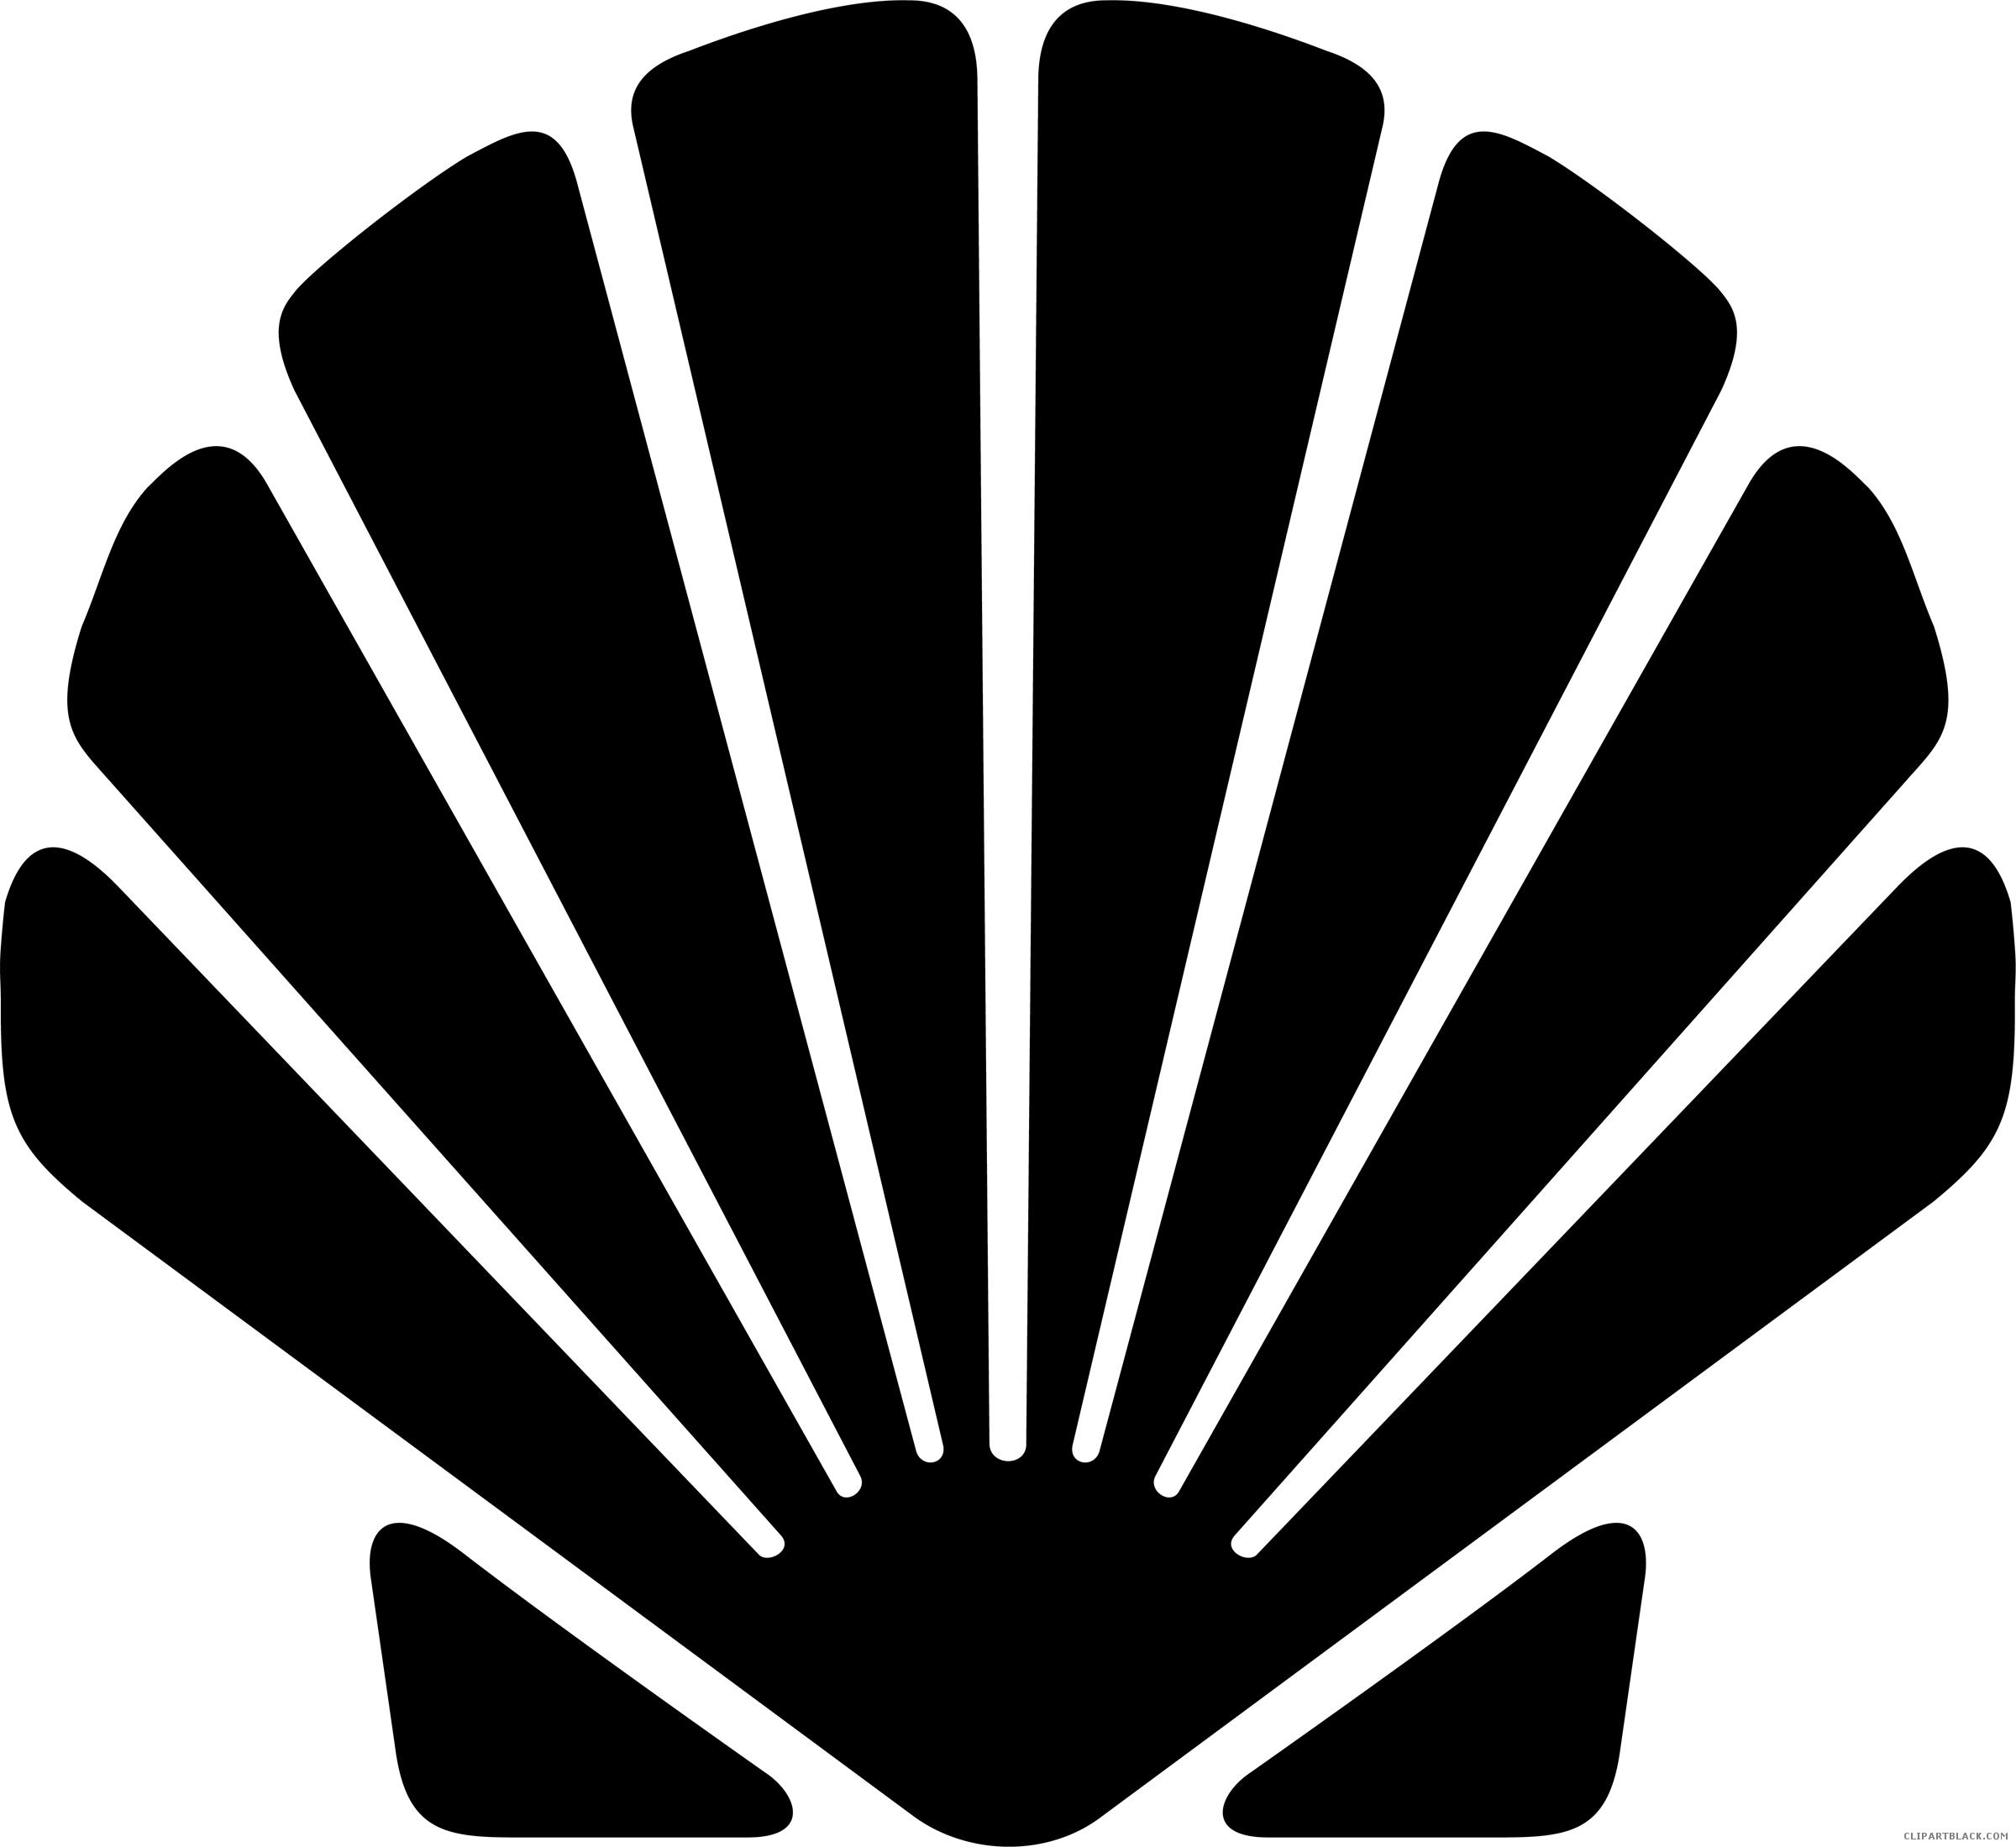 Black clipart seashell. Silhouette clipartblack com animal